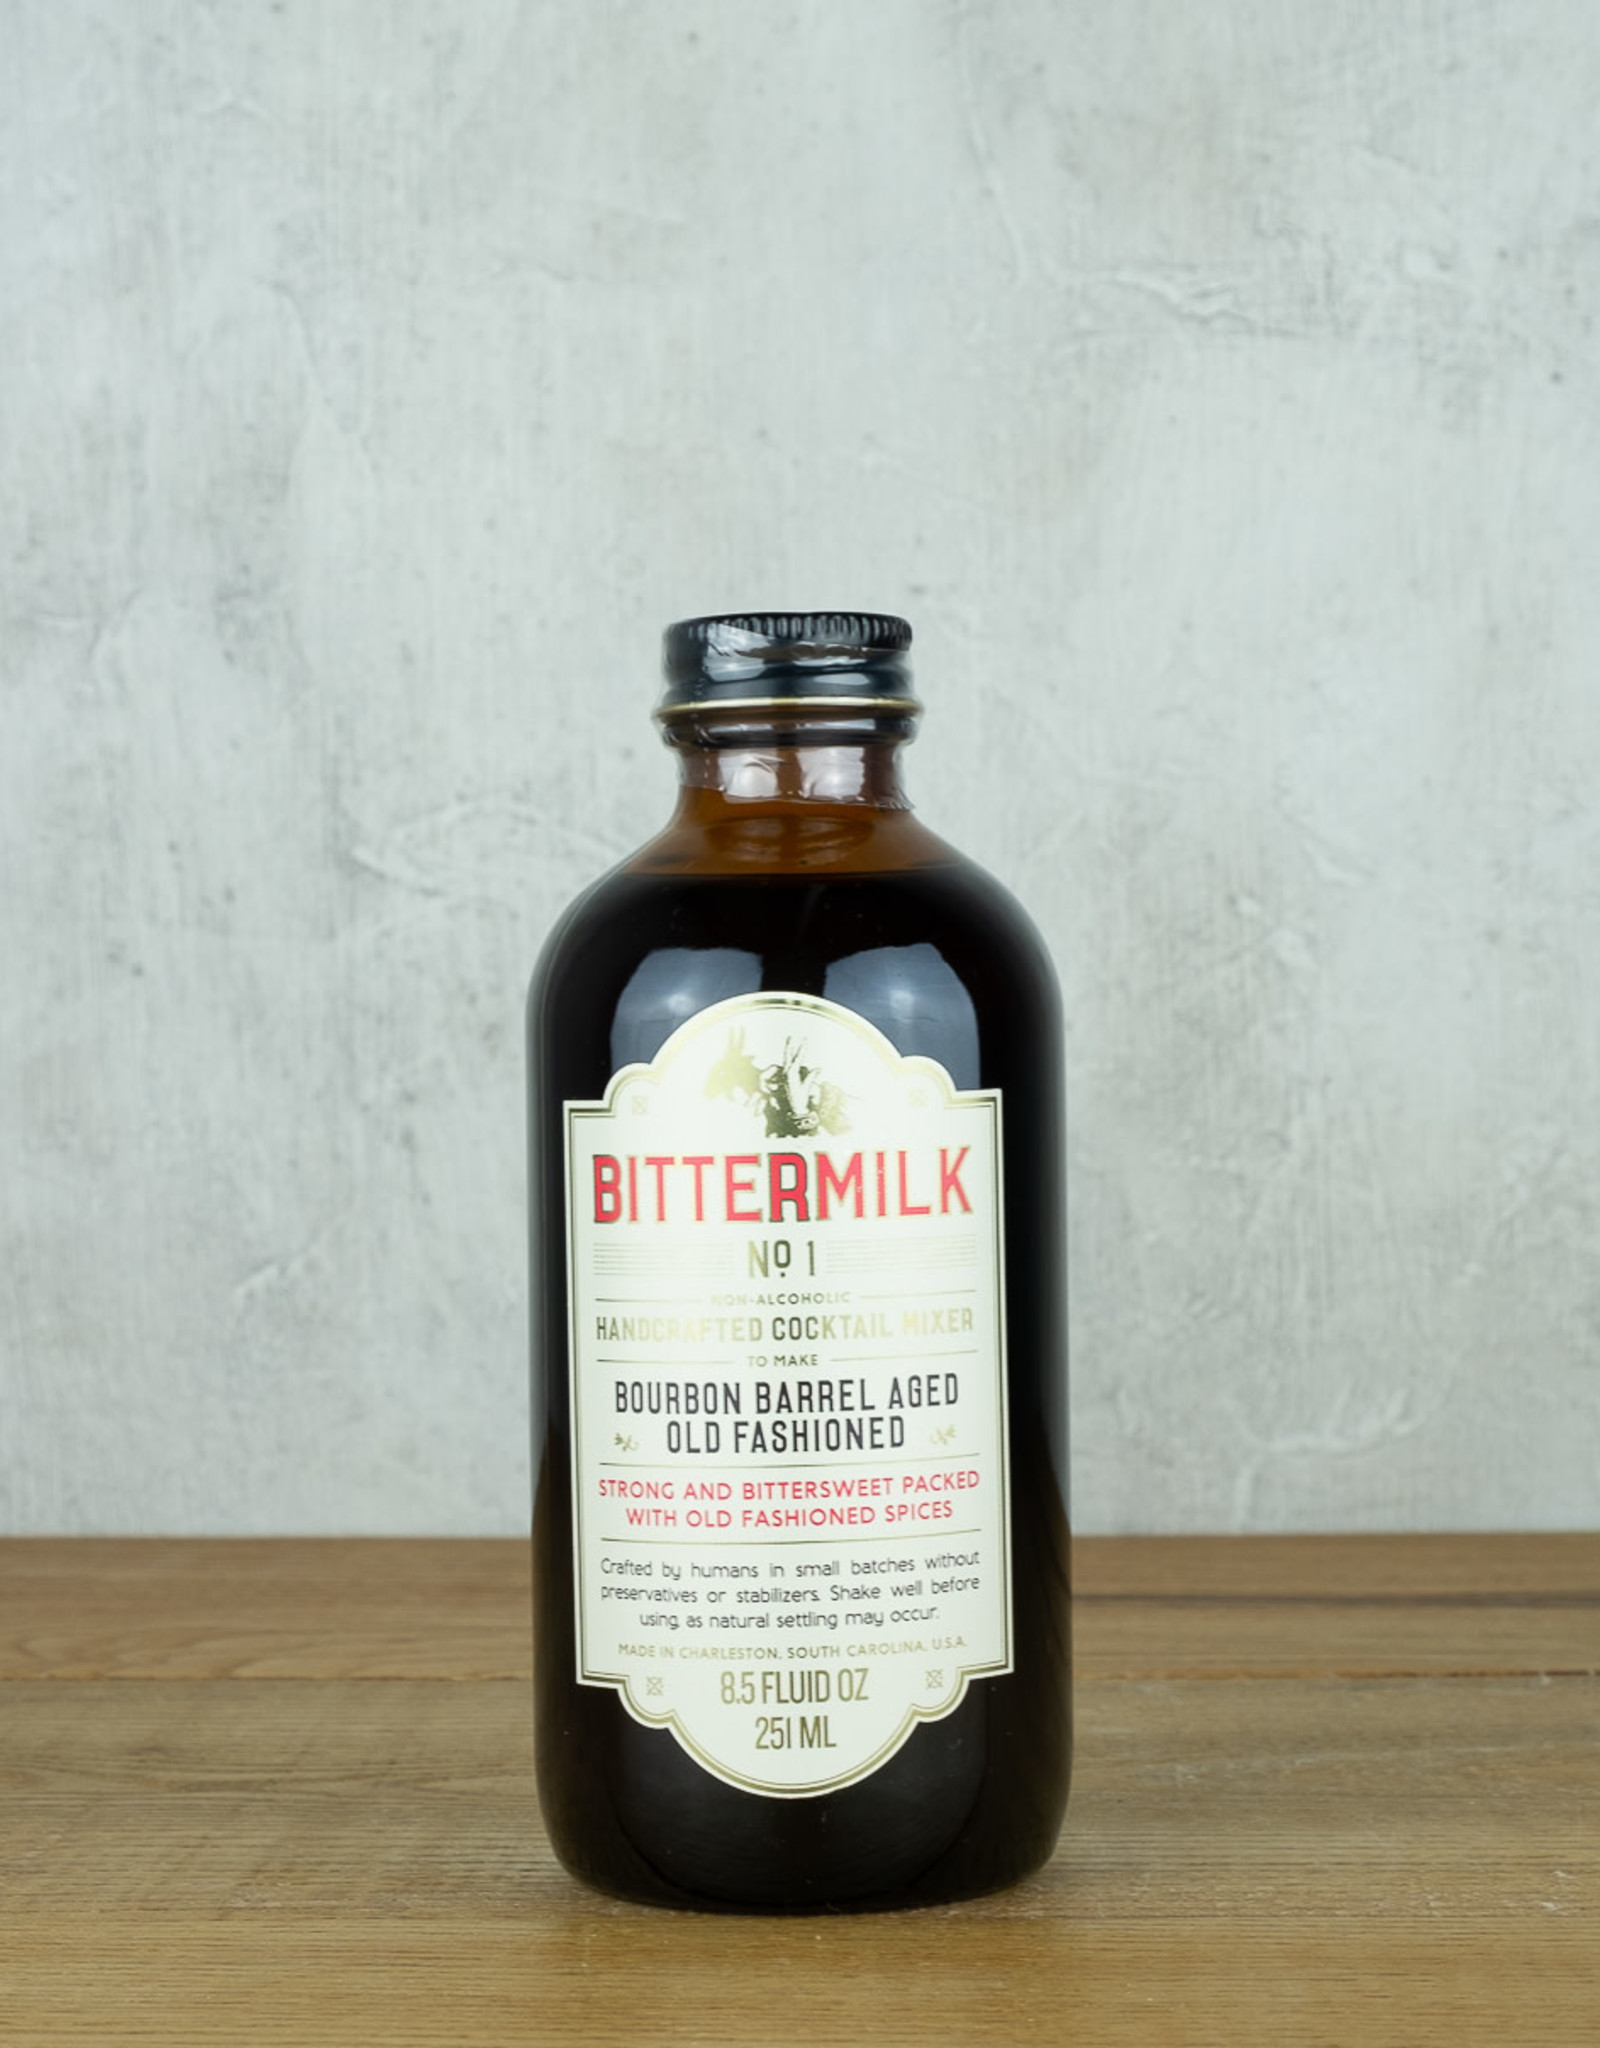 Bittermilk Bourbon Barrel Aged Old Fashioned